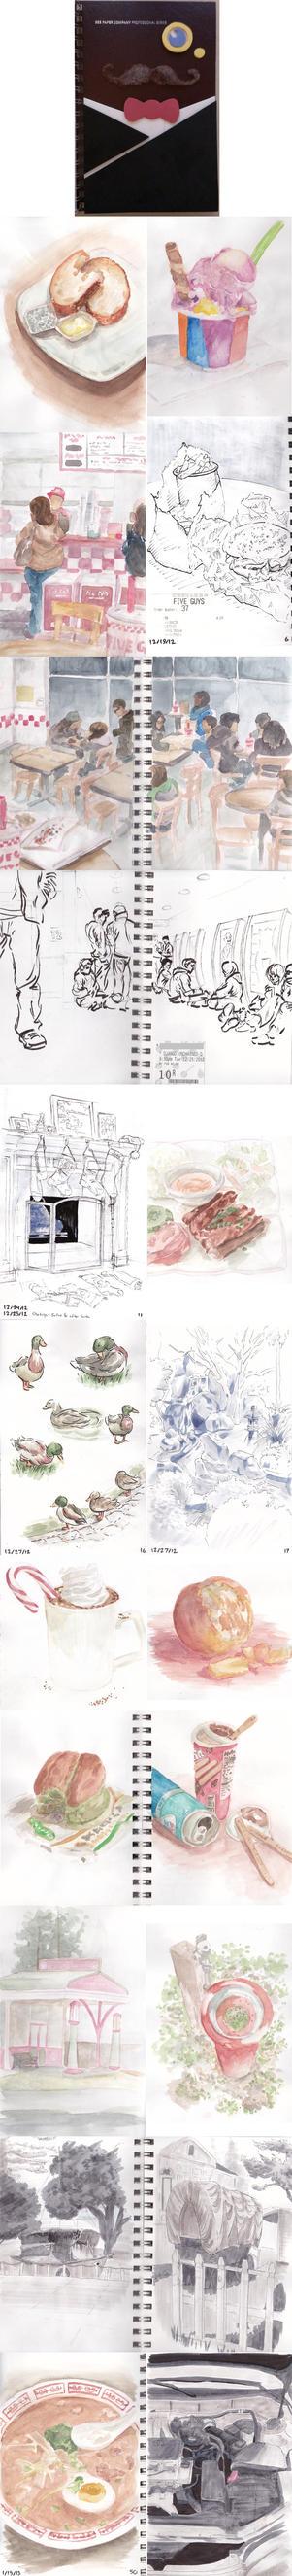 Winter (2012-2013) Sketchbook stuff by Klecktacular